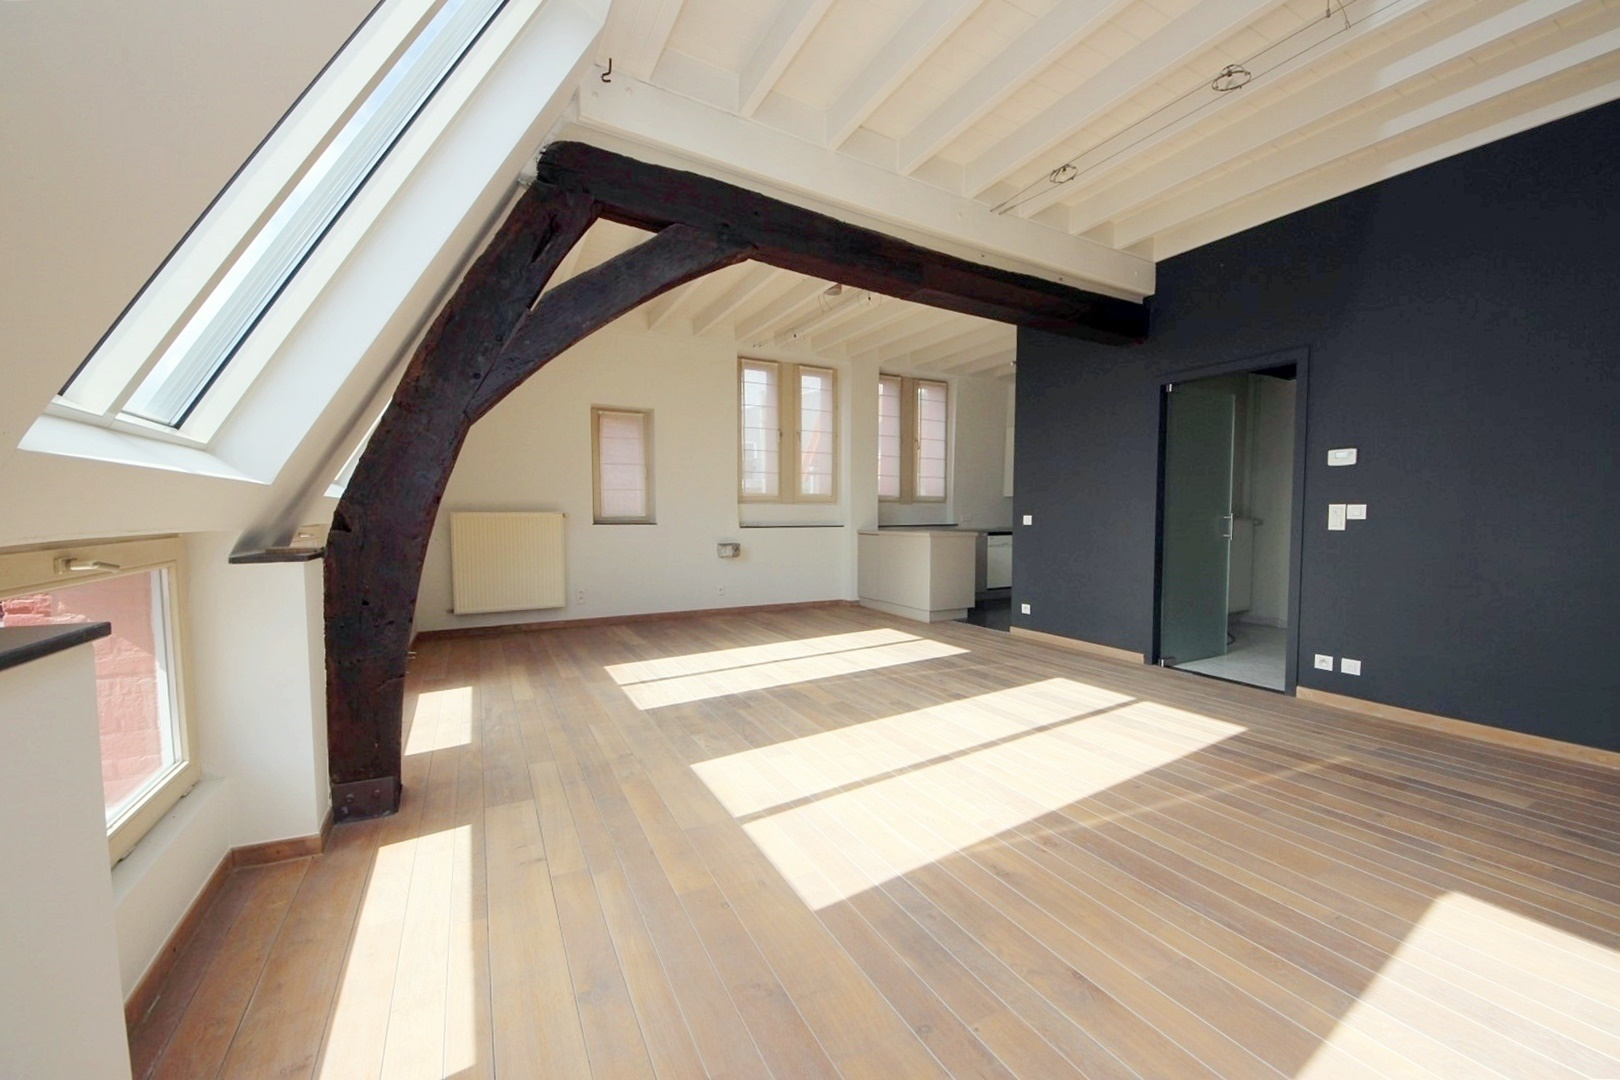 Charmant duplex-appartement in hartje Gent